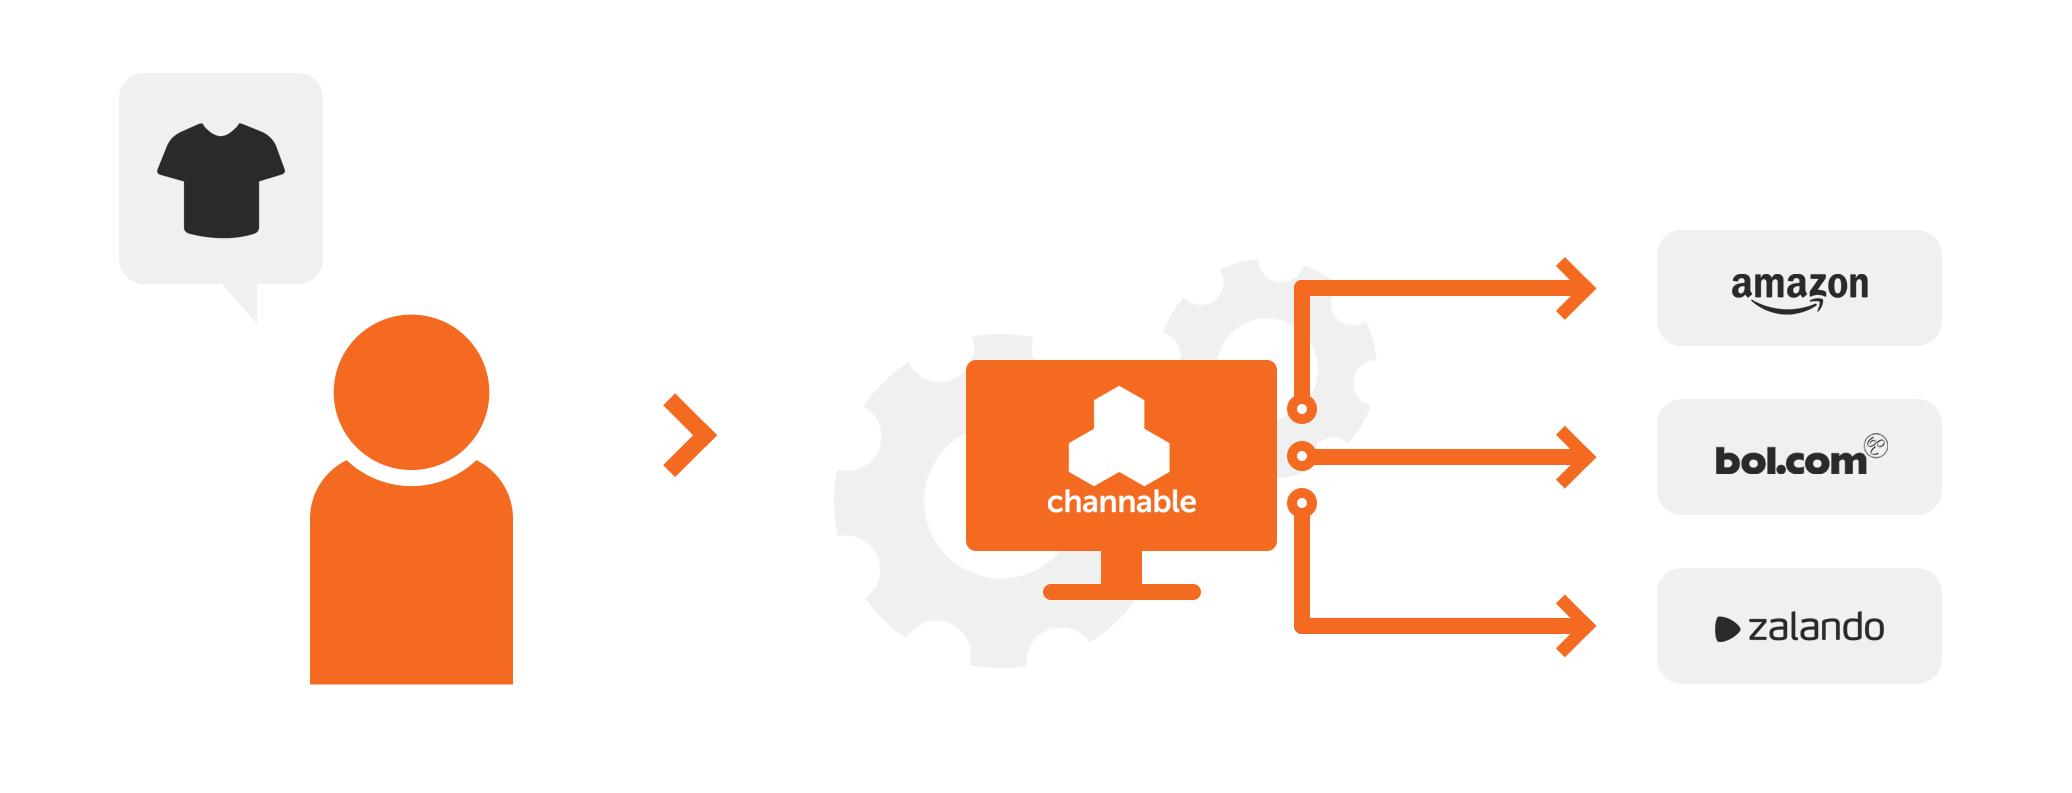 Brandsom Visual - Integratie (Channable)